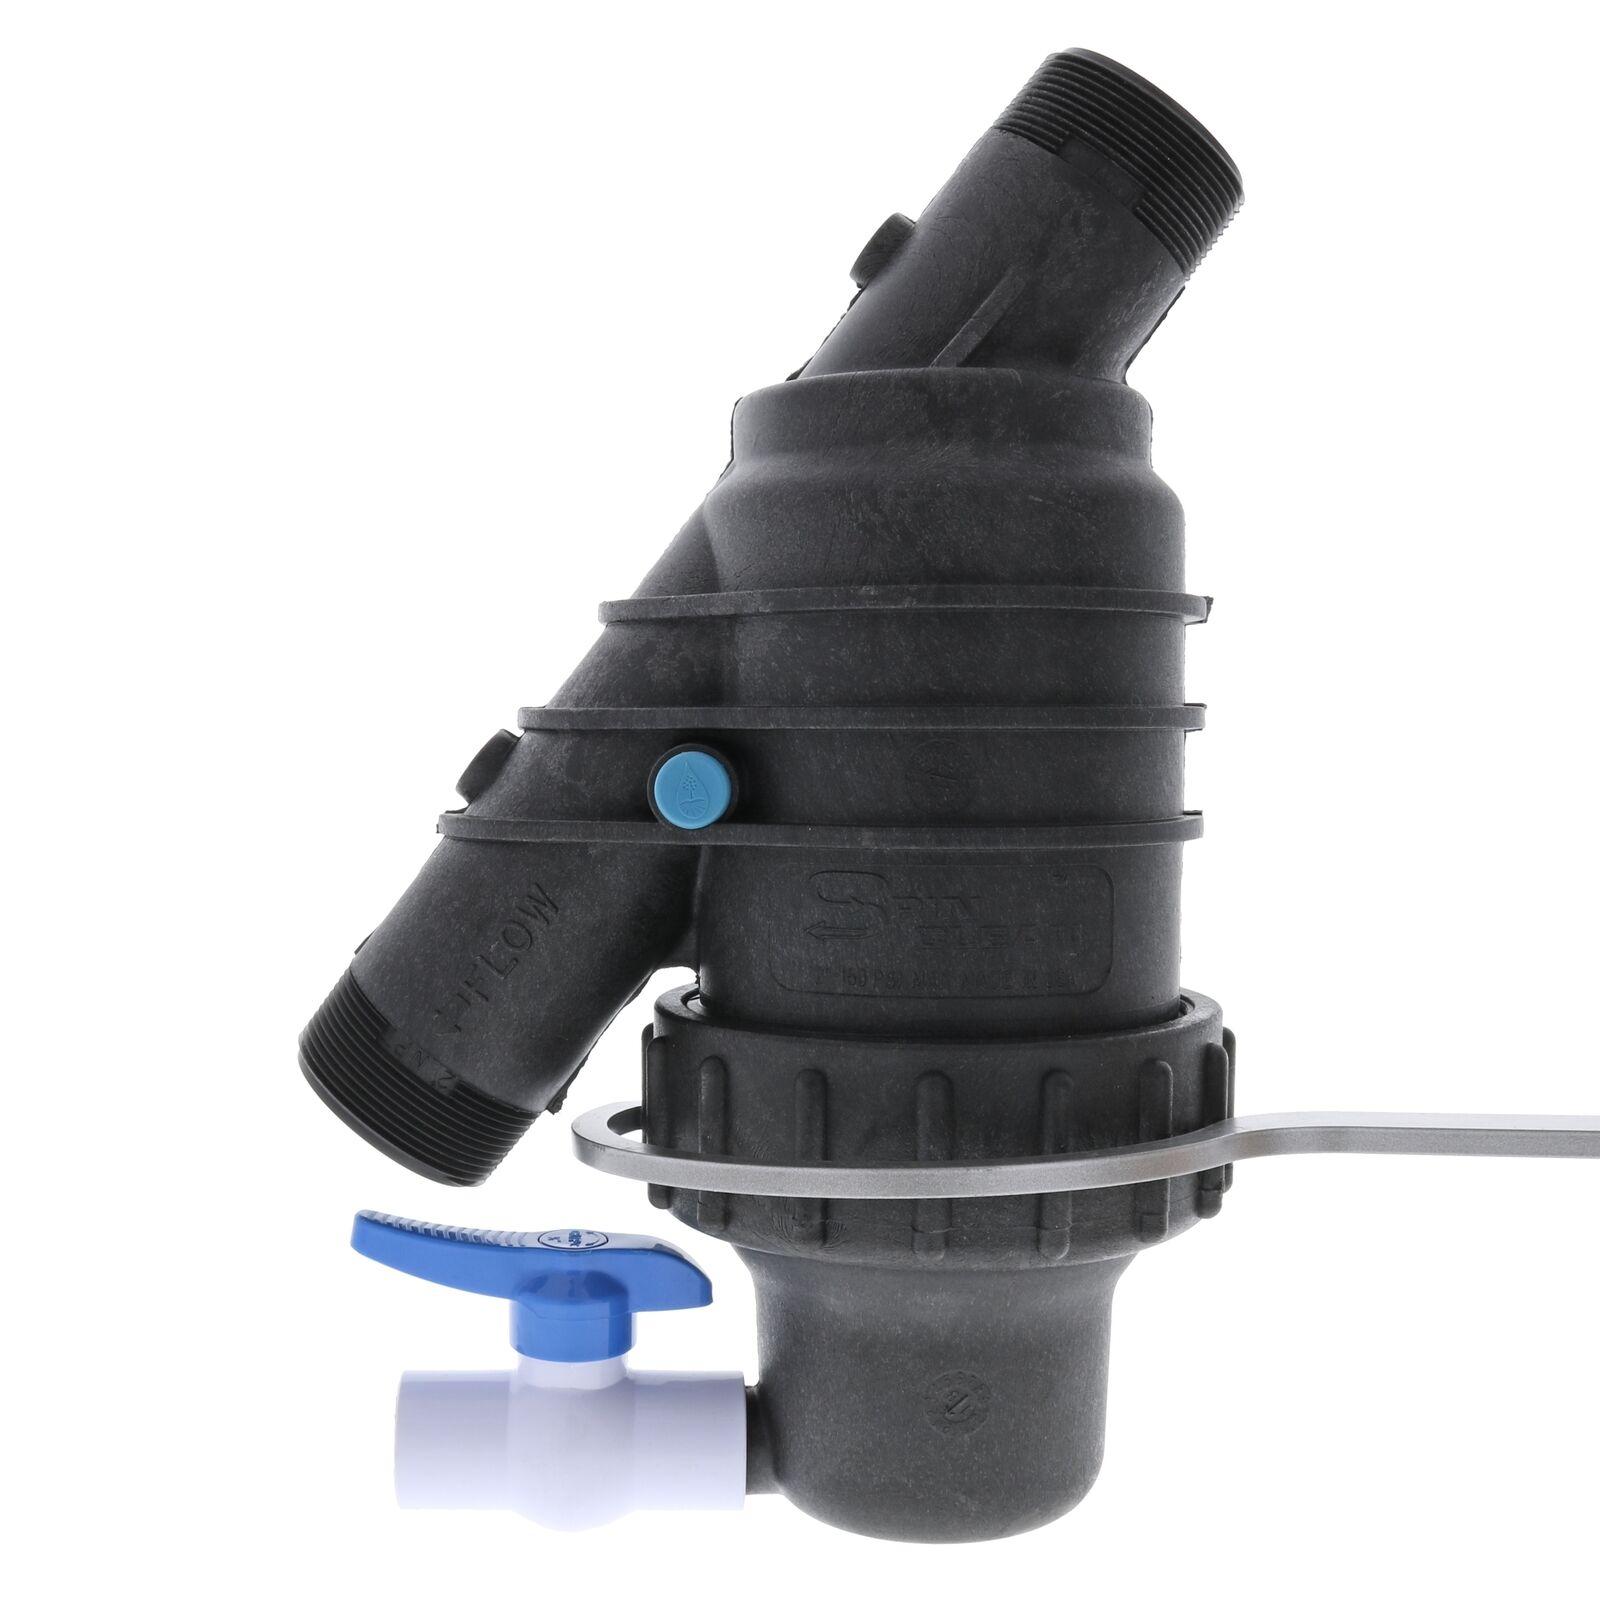 Jain Spin Clean High Flow Filters-Größe 2  Pipe Thread-Filtration 150 Mesh